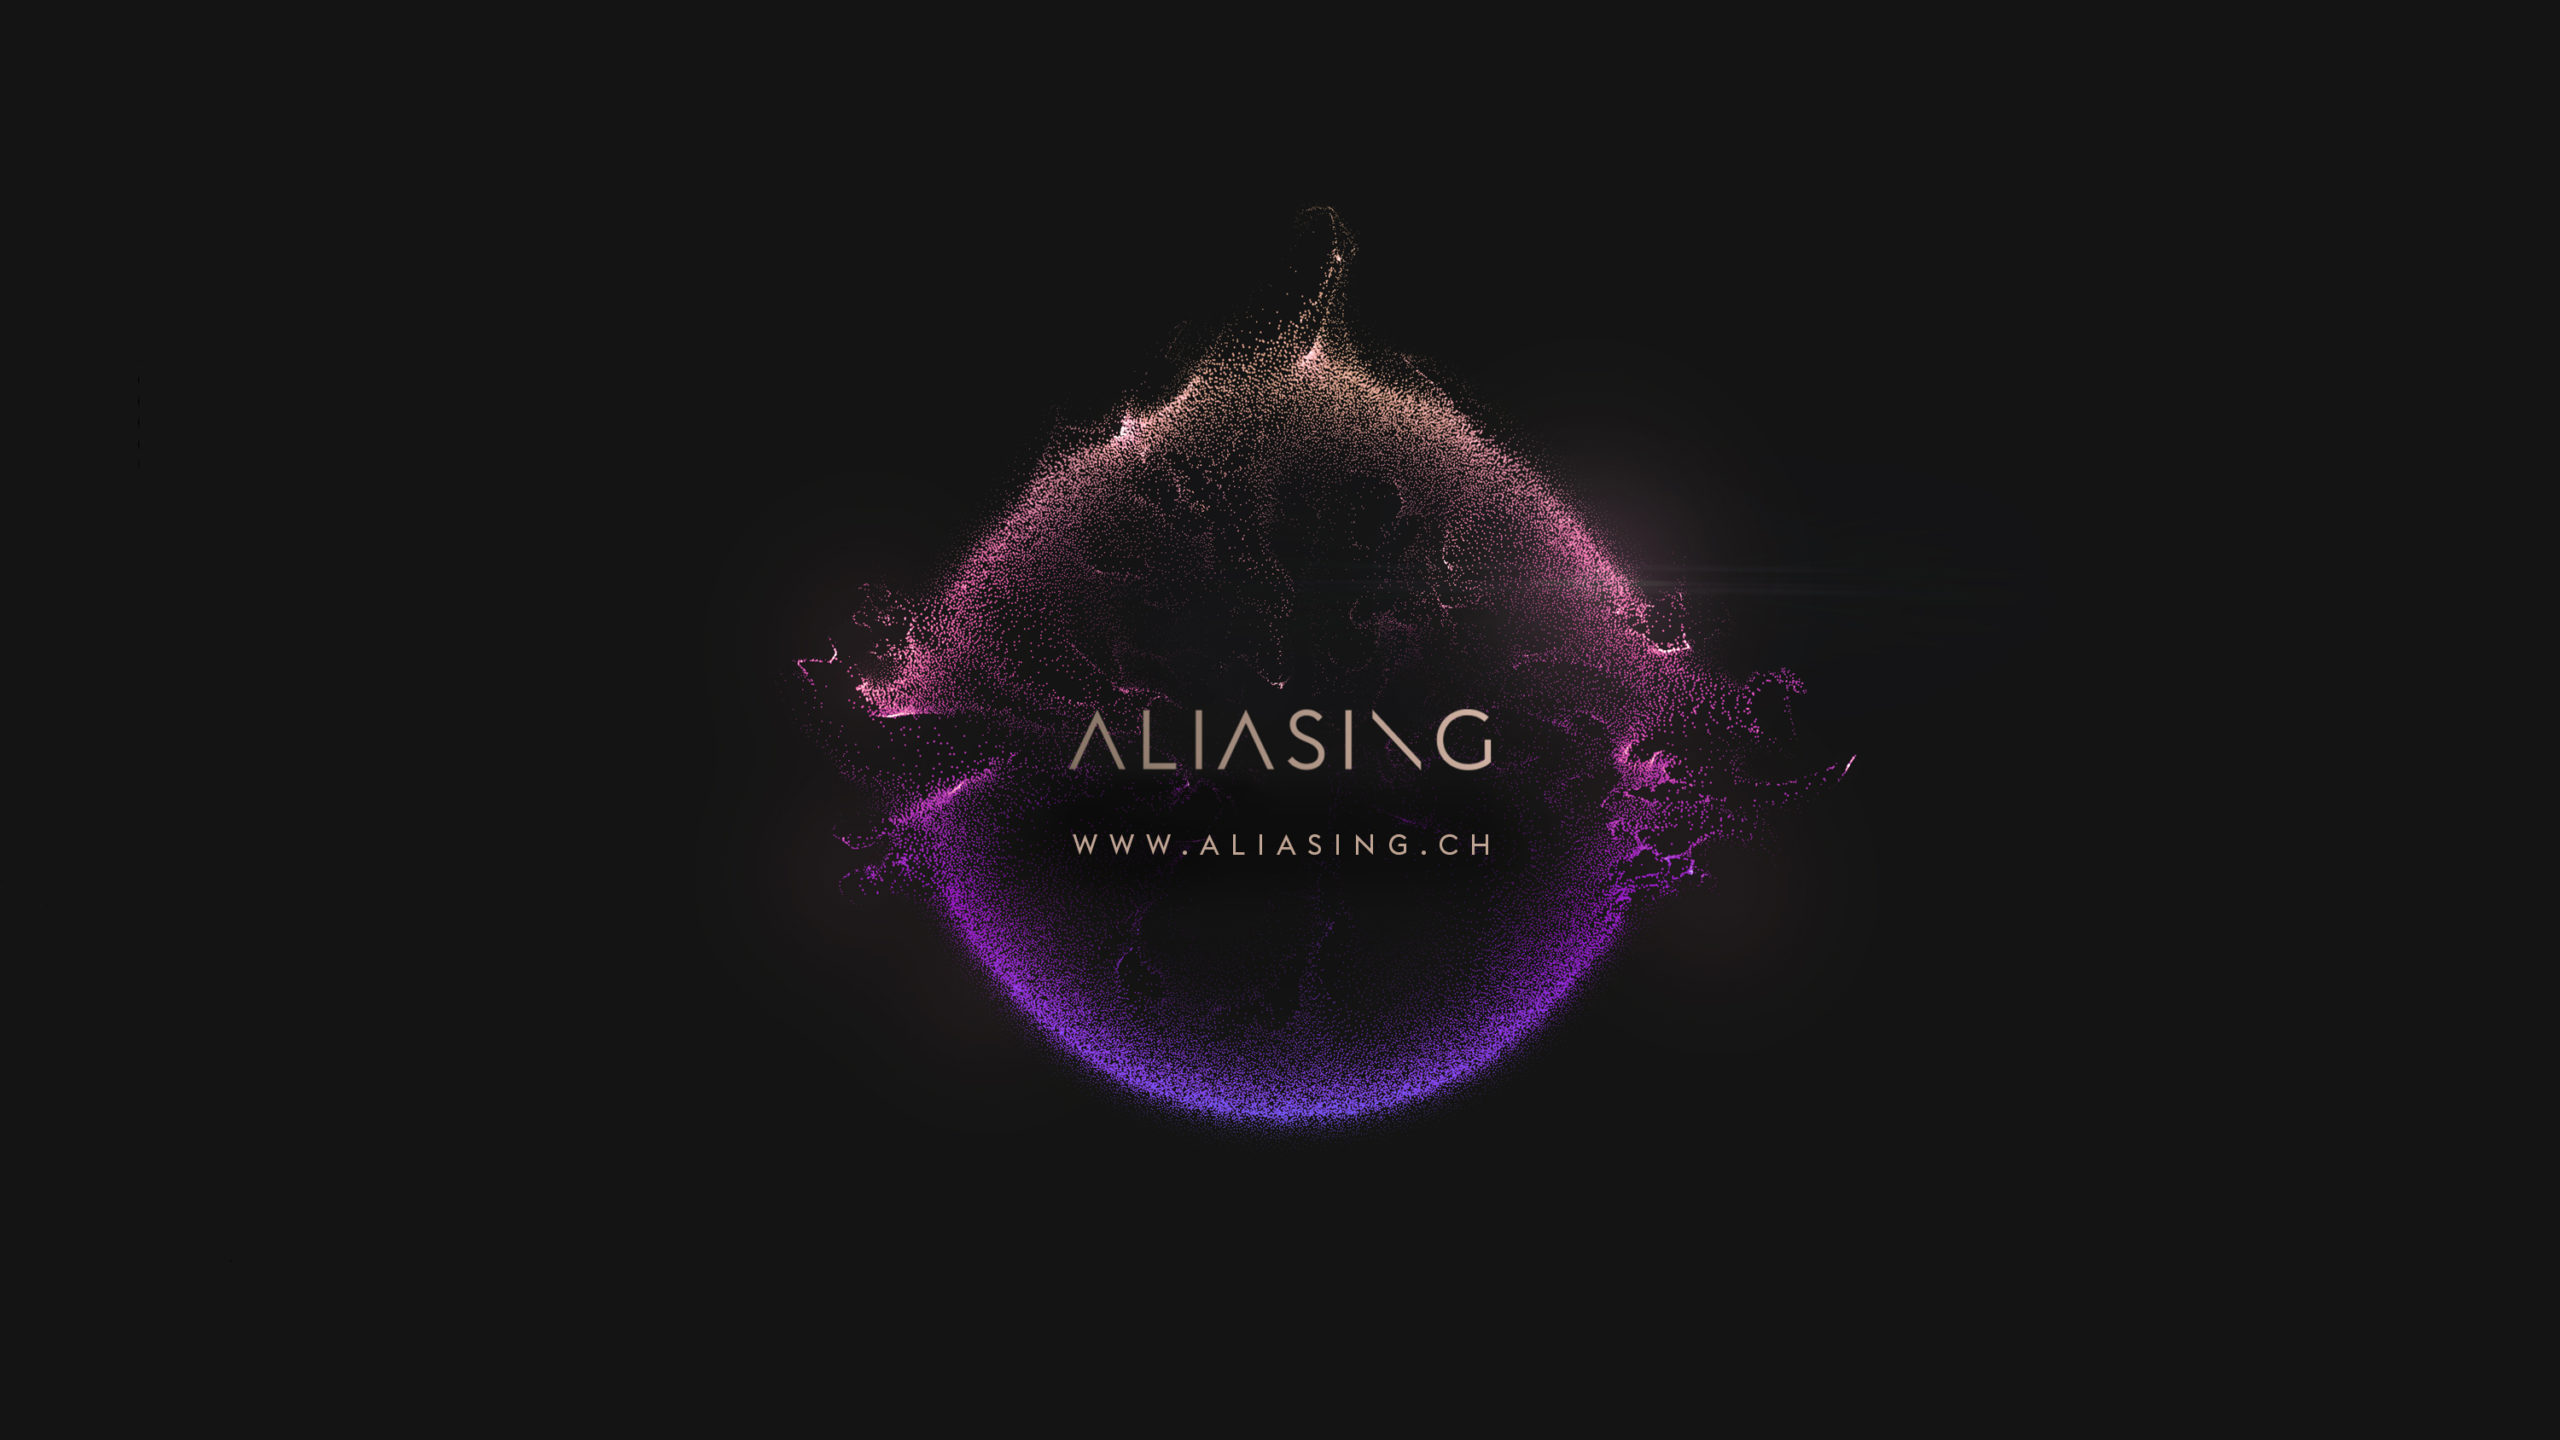 Aliasing – Motion Design 2D / 3D